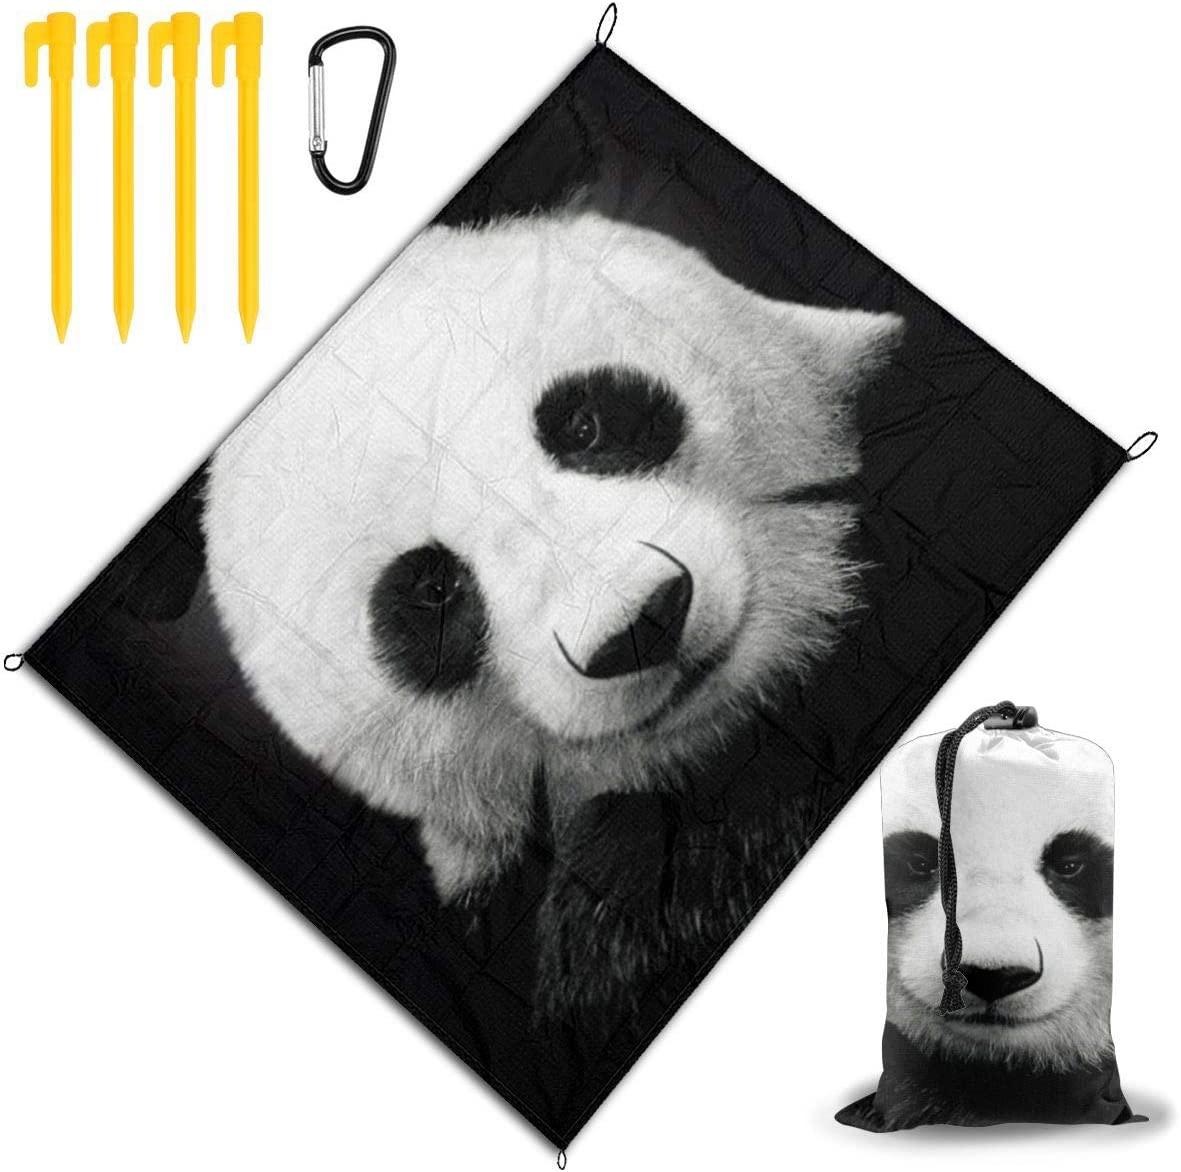 JEKYDOSD Animal Panda Printed Picnic Mat,Travel Outdoor Beach Blanket Durable Waterproof Sand Beach Mat Blanket for Travel Camping Hiking 67